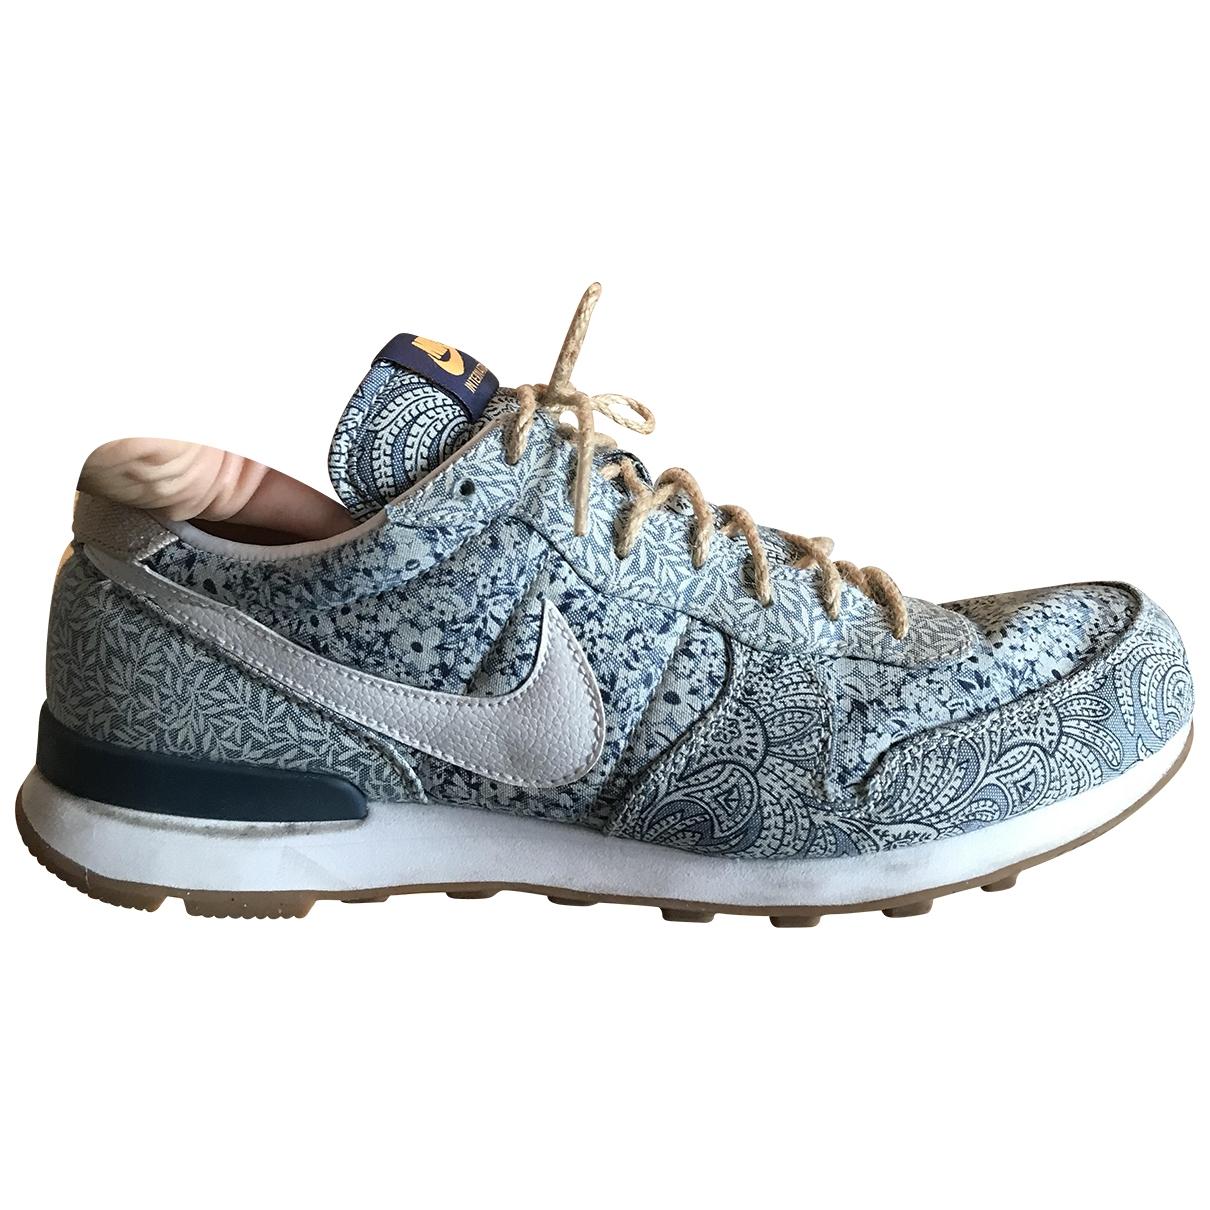 Deportivas Internationalist de Lona Nike